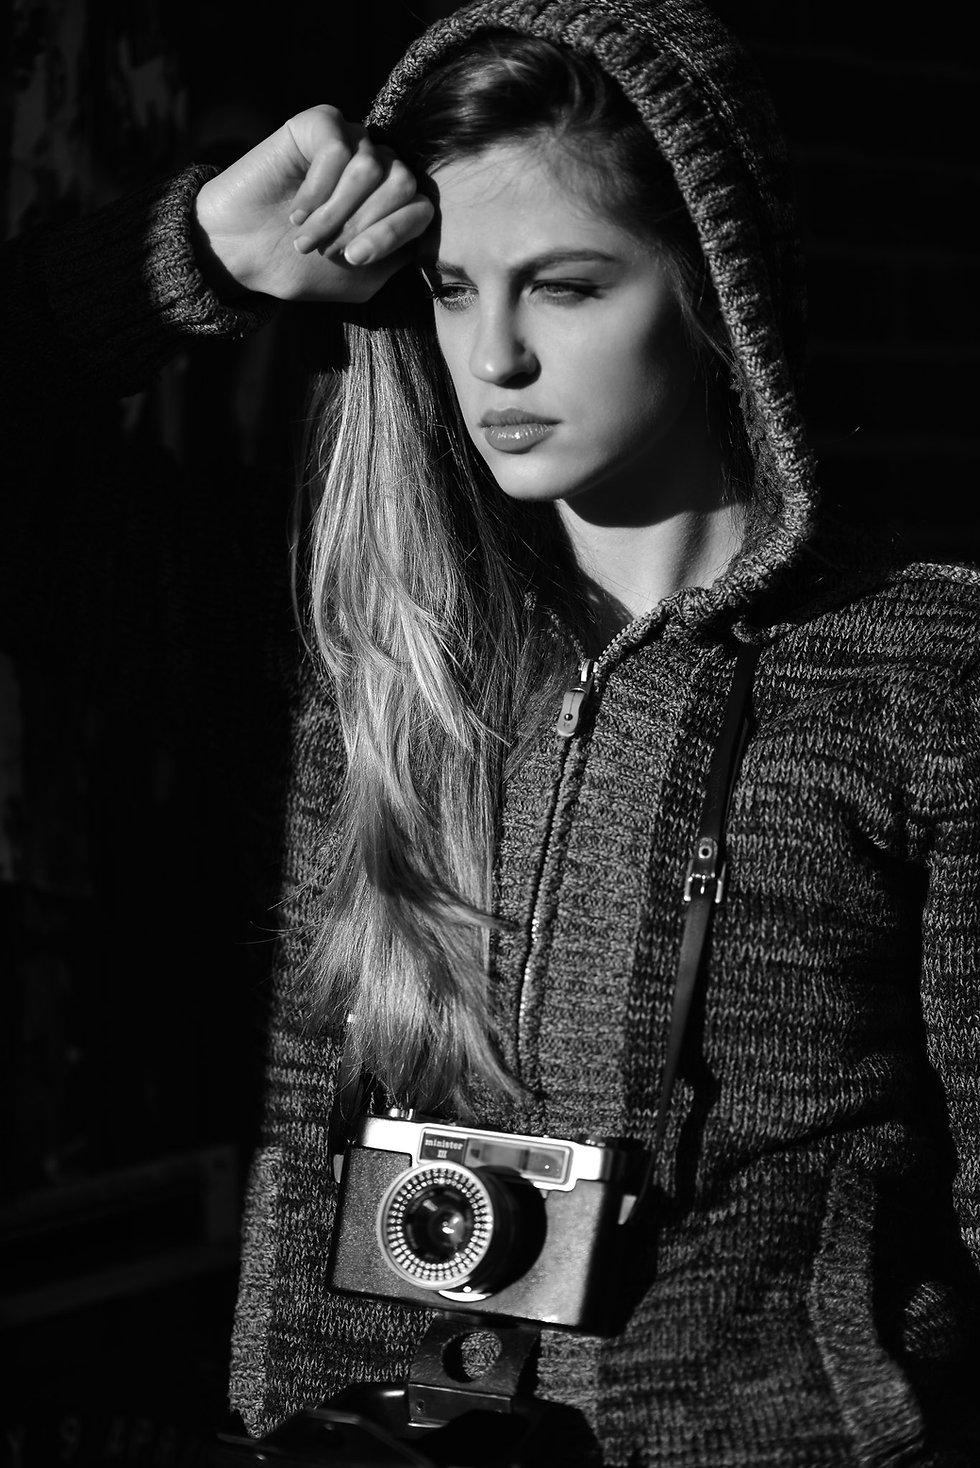 Sofiia Nevezhina - Streetstyle Urban Fashion by Kees Penders